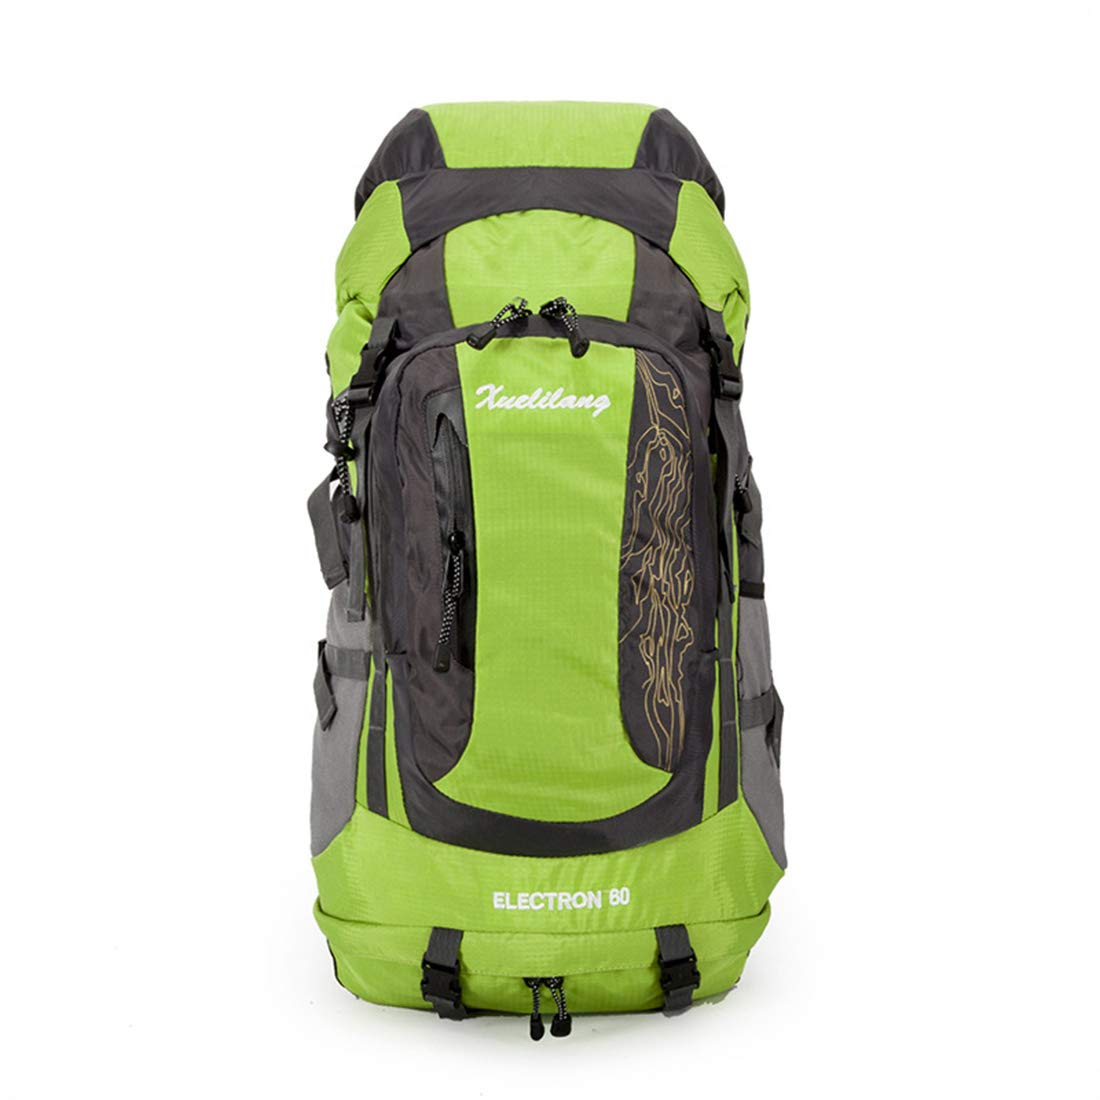 CAFUTY バックパック多機能大容量トラベルキャンプクライミングハイキングトレイルレジャースポーツ多機能荷物用バッグ屋外での使用に適したニュートラル (Color : オレンジ) B07N6819P4